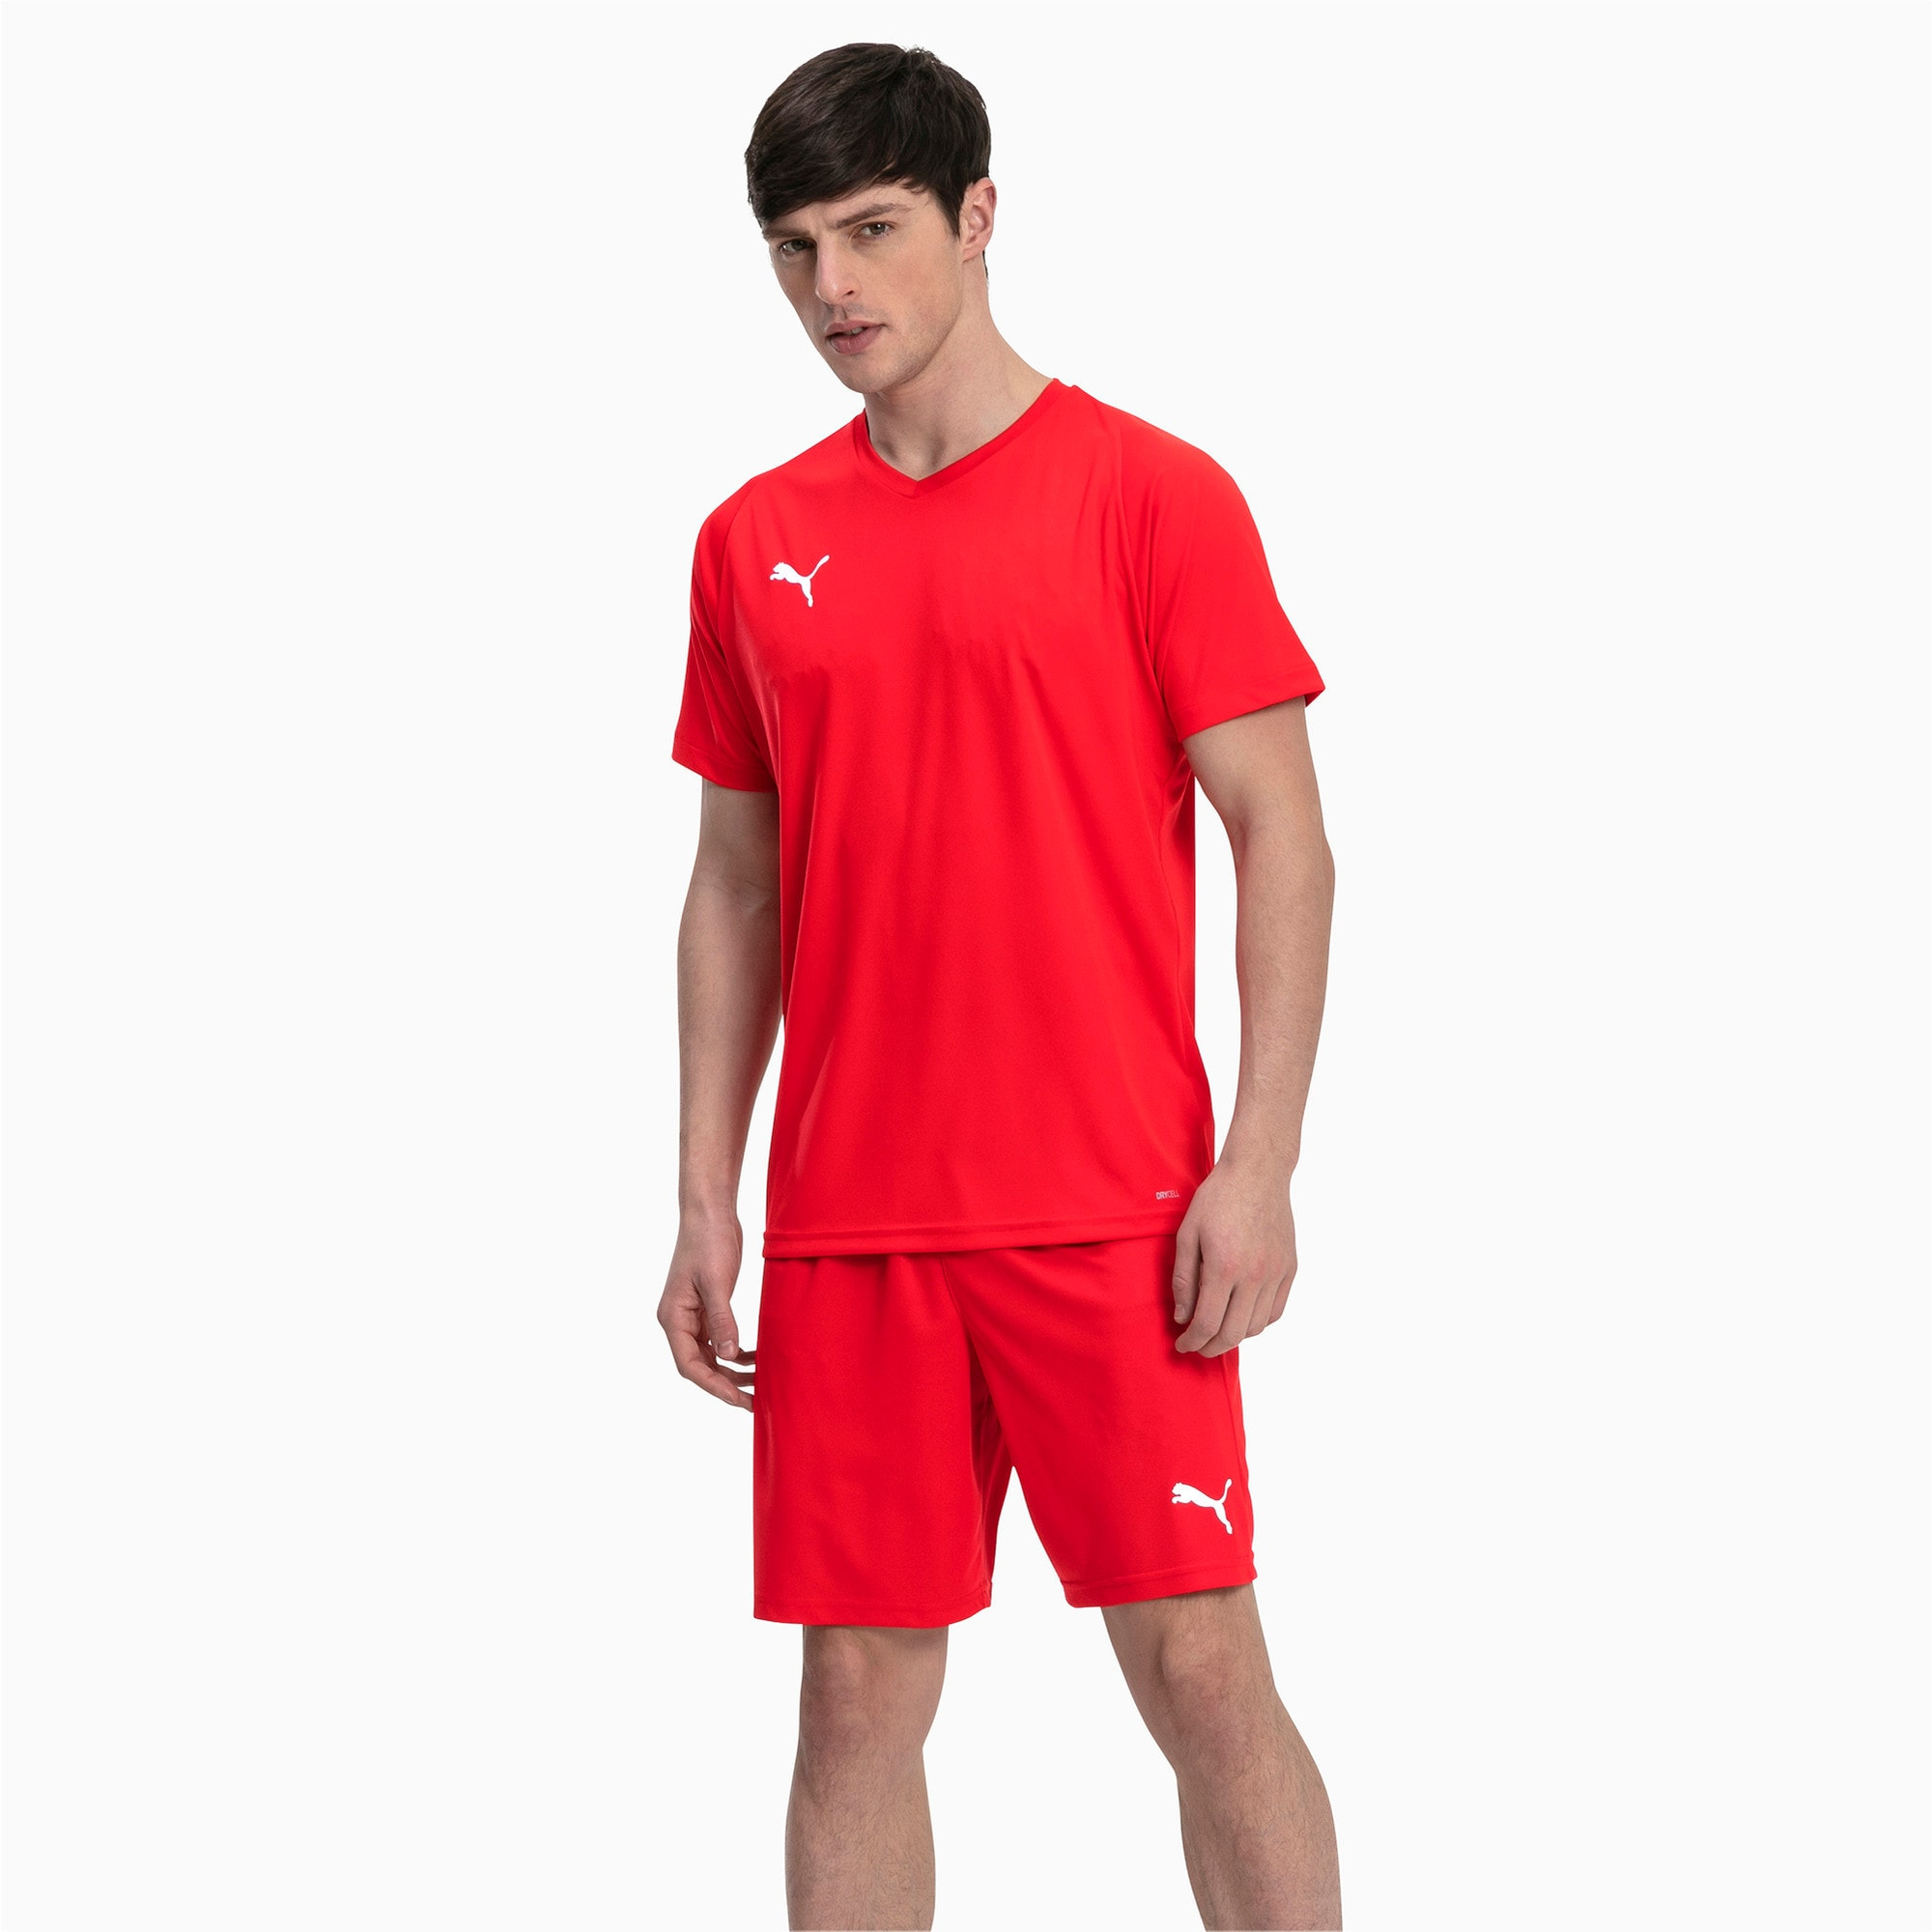 Thumbnail 3 of Liga Core Men's Shorts, Puma Red-Puma White, medium